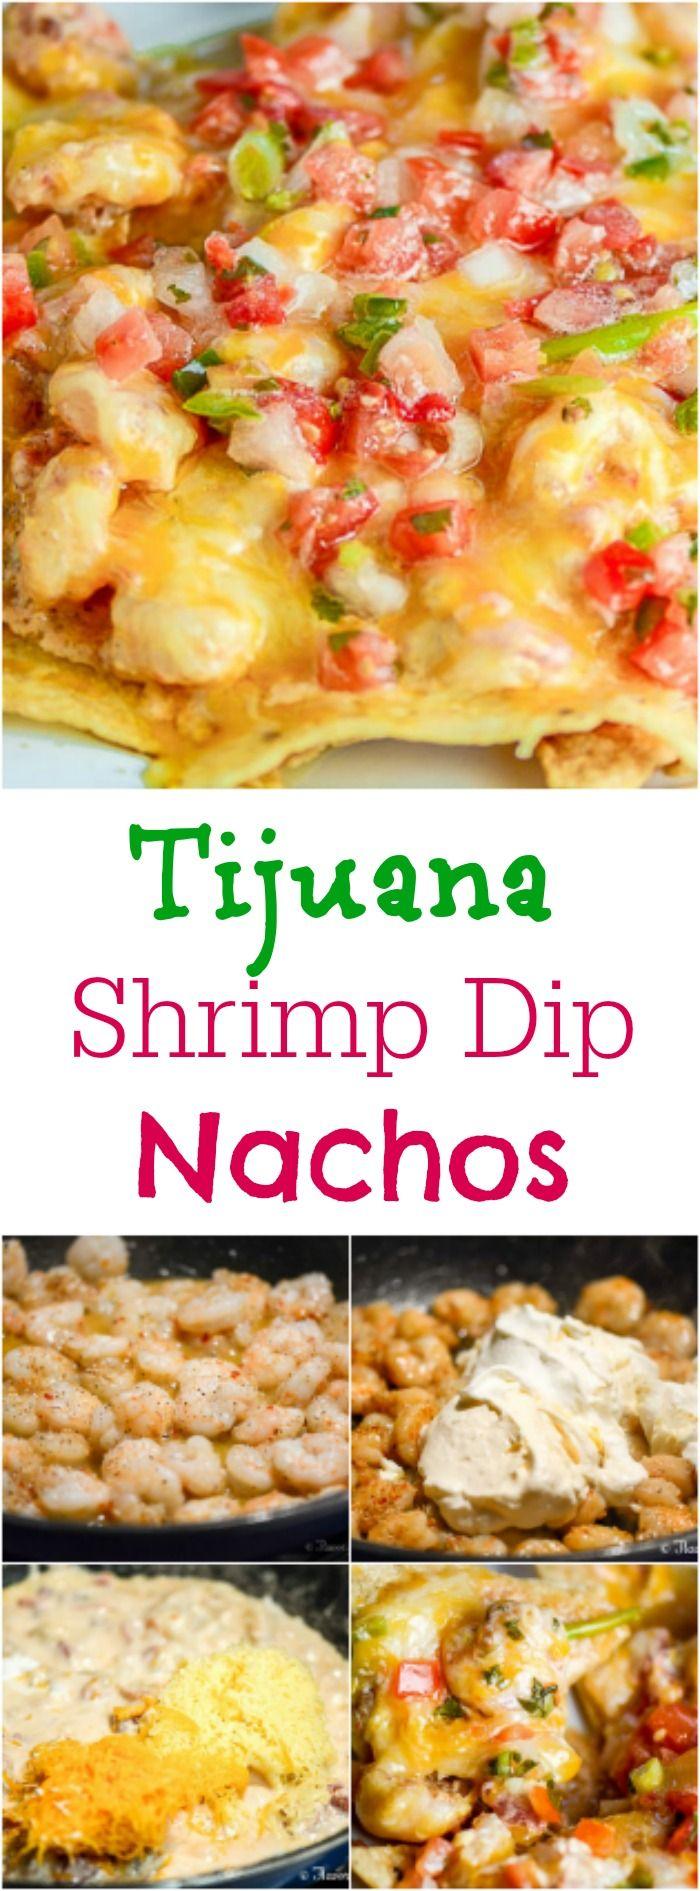 Tijuana Shrimp Dip Nachos are a cheesy, creamy, spicy, and crunchy appetizer. ~ http://FlavorMosaic.com  #JustAddRotel #ad